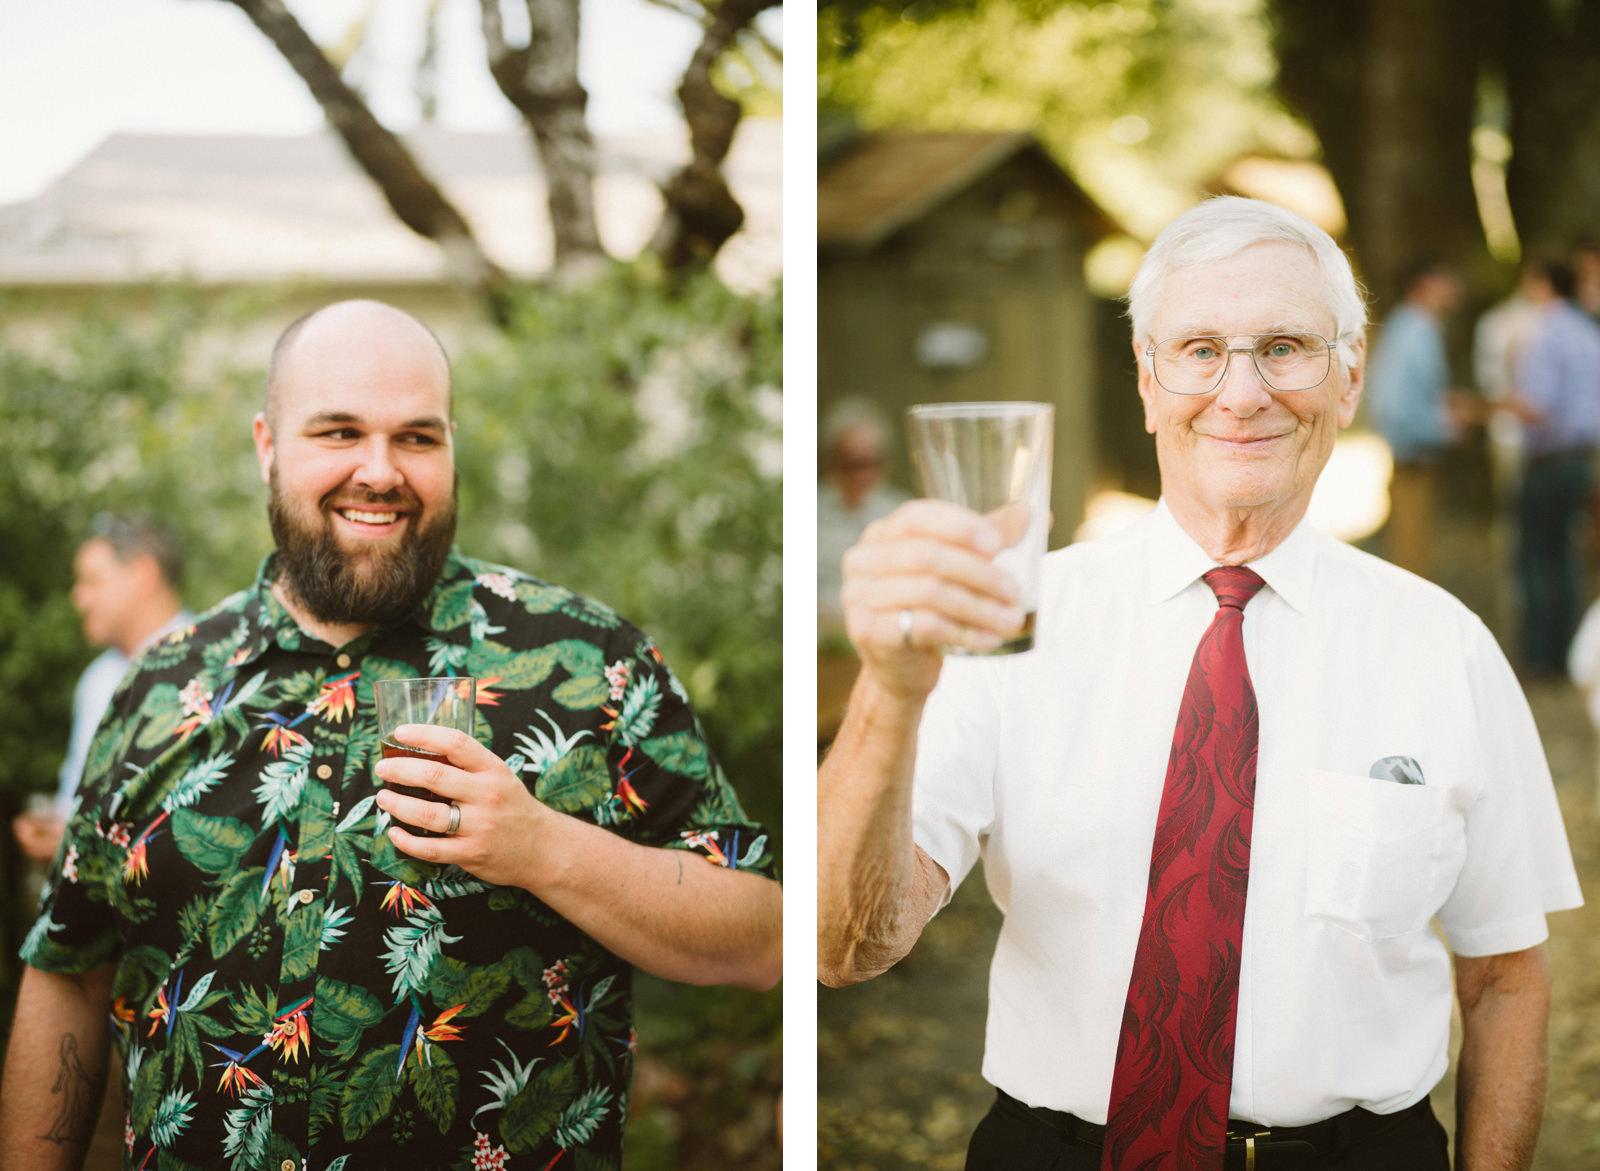 rivers-bend-retreat-wedding-065 RIVER'S BEND RETREAT WEDDING